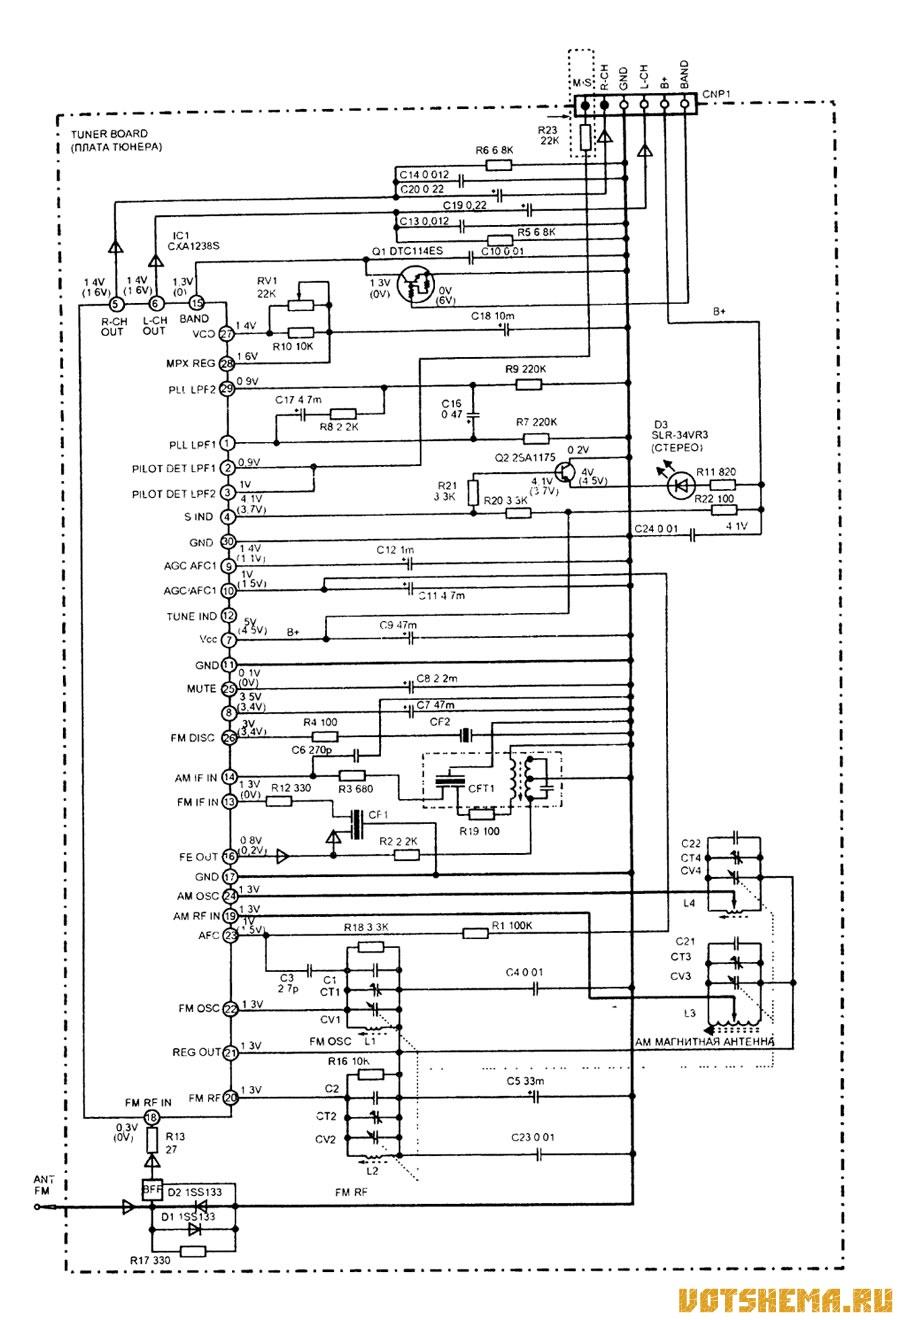 Cdx-f5500x схема подключения